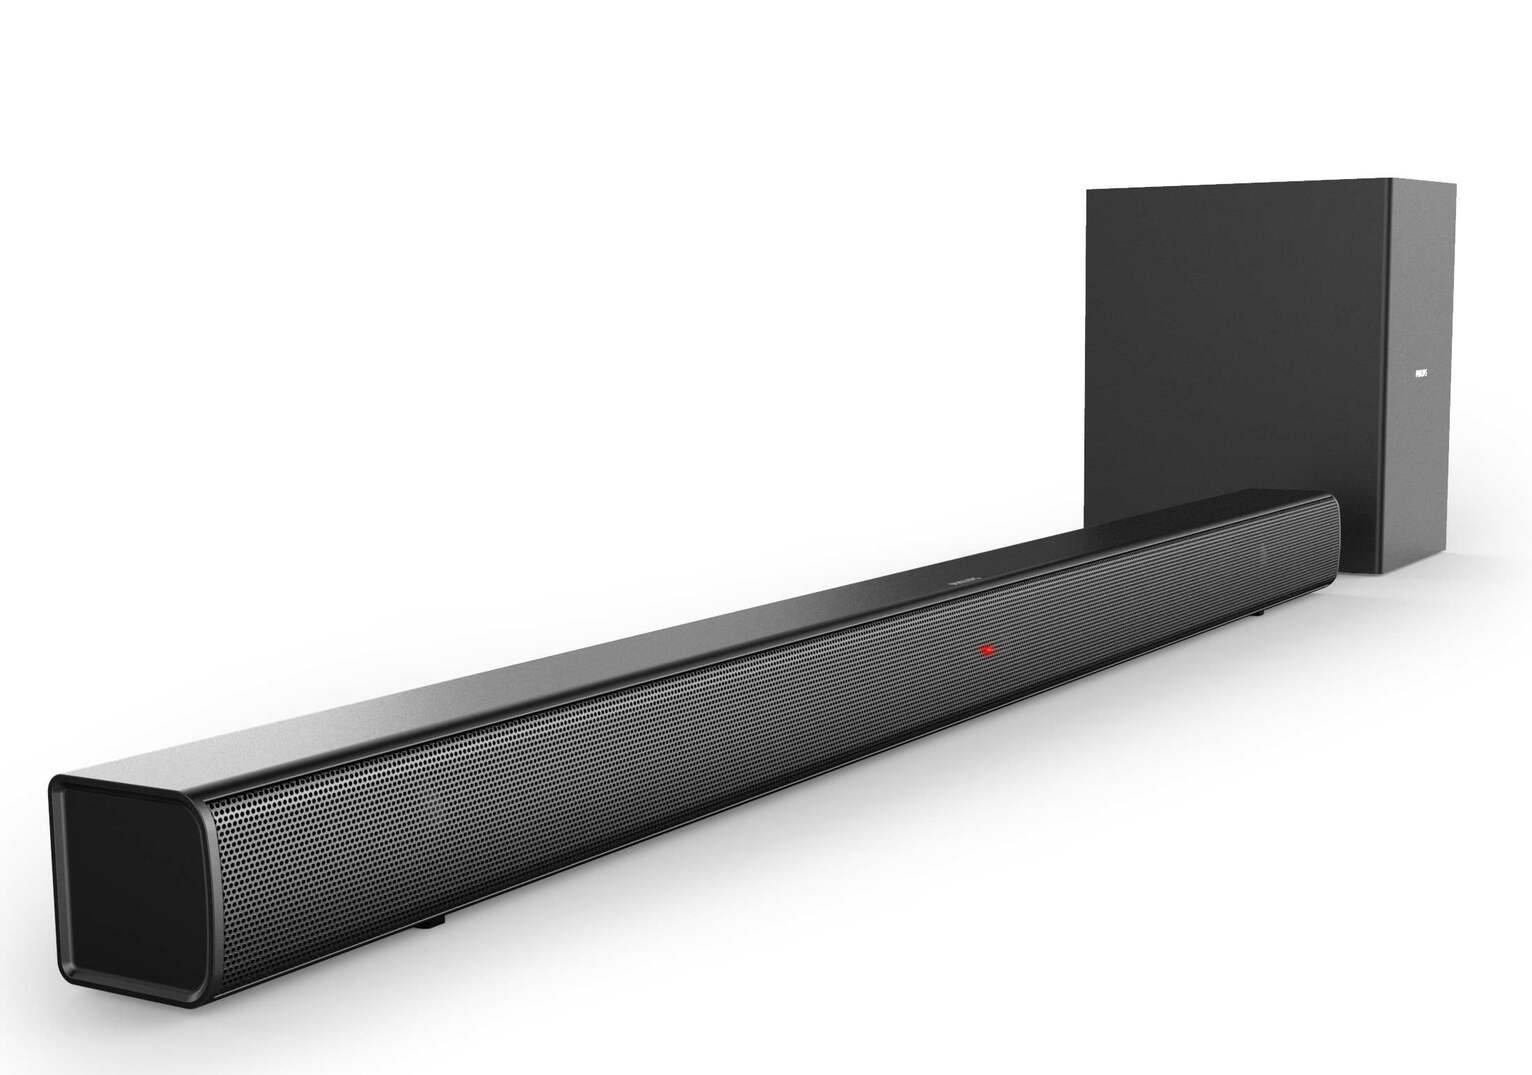 Philips HTL1520B/05 70W RMS 2Ch Sound Bar with Wireless Sub